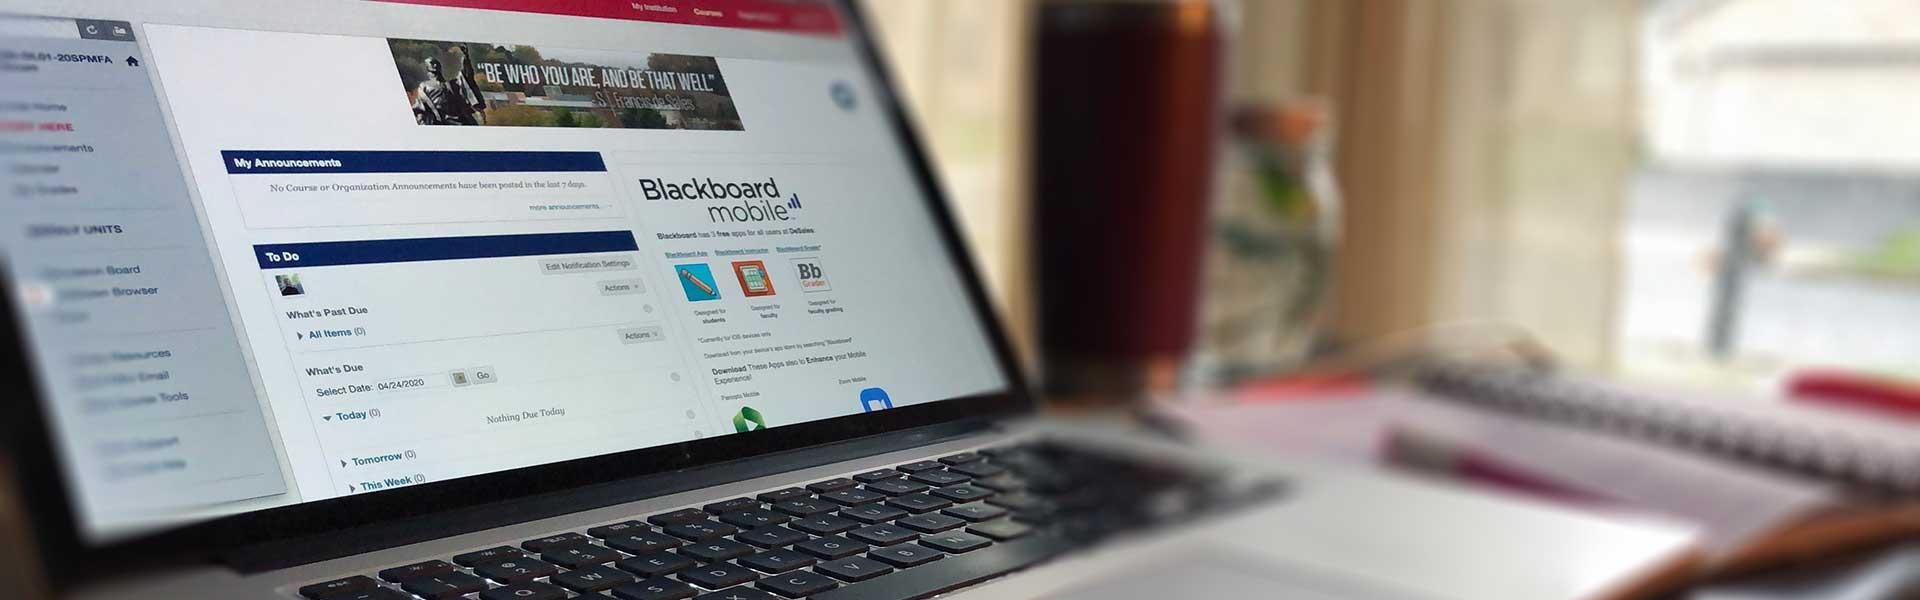 BlackboardLaptop-slim